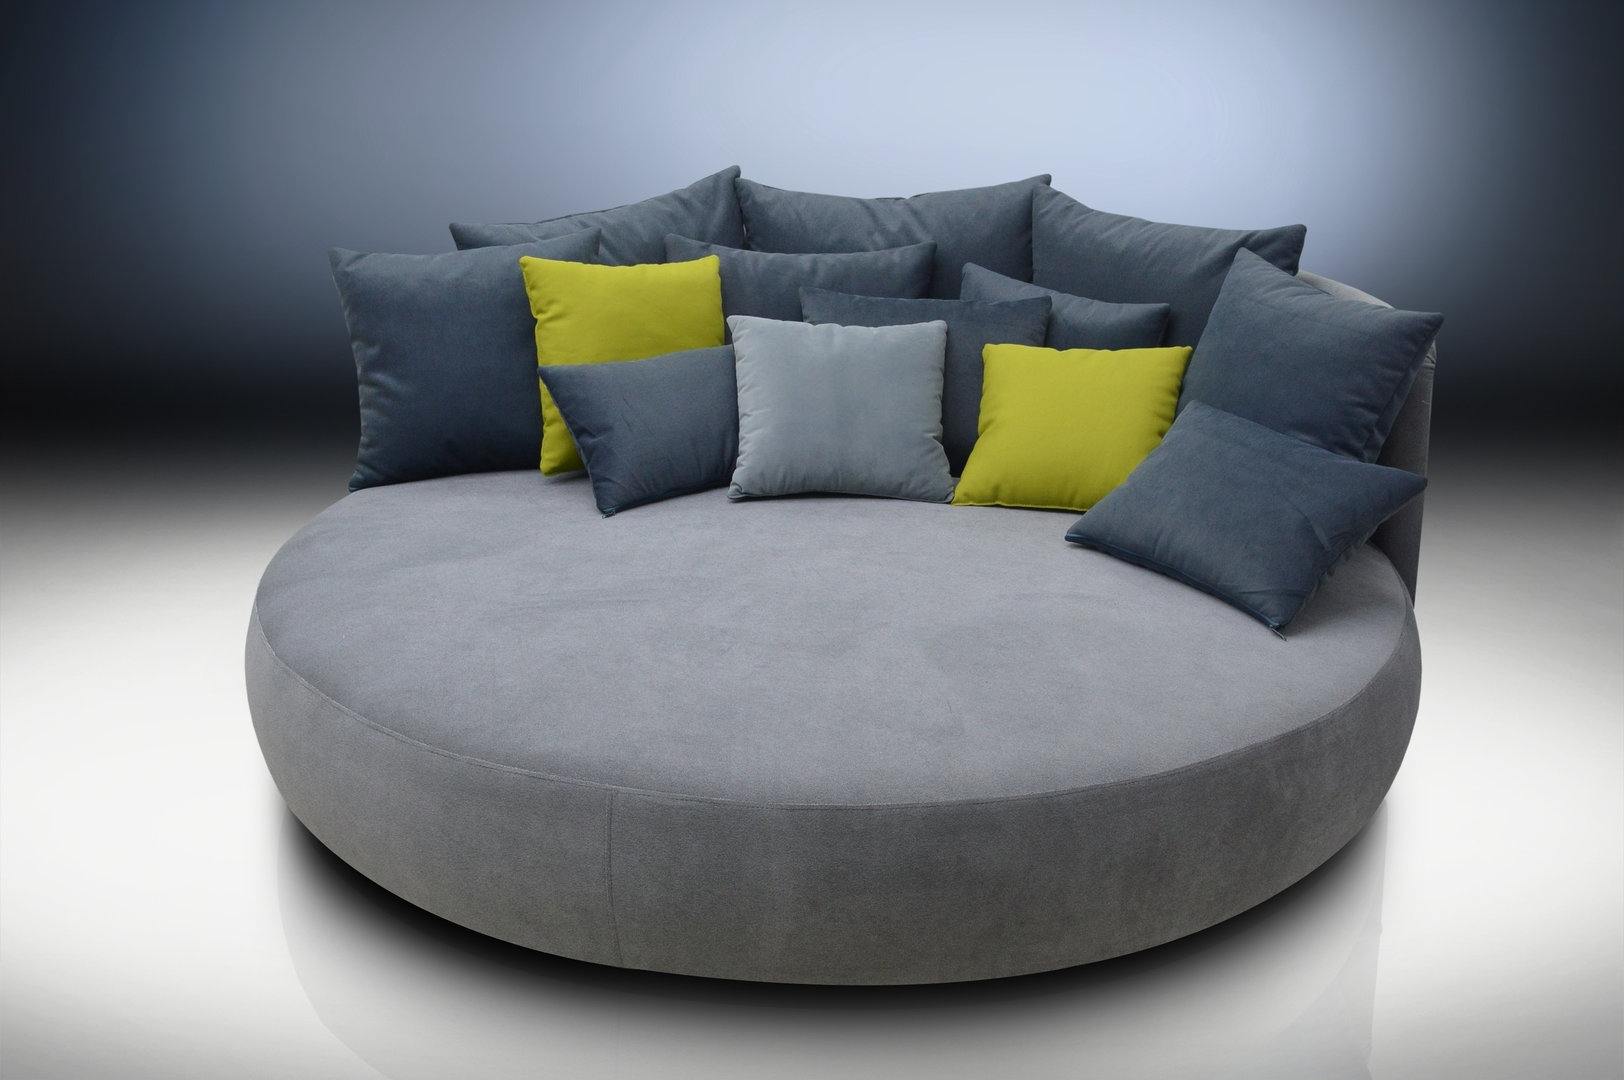 Sofa : Sofa Chair Round Elegant Sofa Half Round Sofa Sofas Round With Favorite Round Sofas (View 16 of 20)